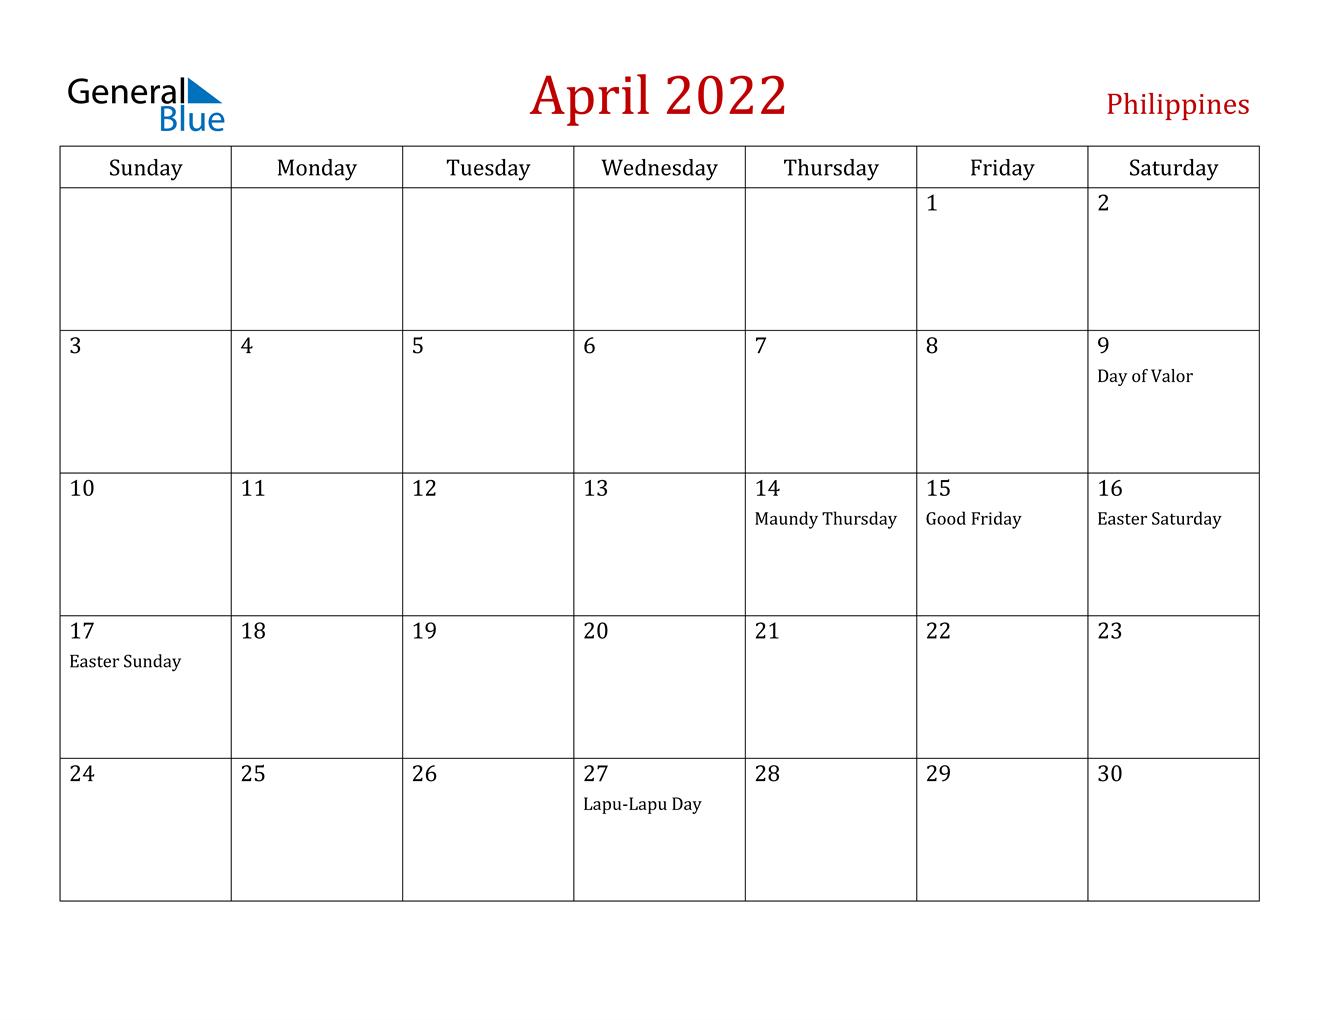 April 2022 Calendar - Philippines within Printable April 2022 Calendar